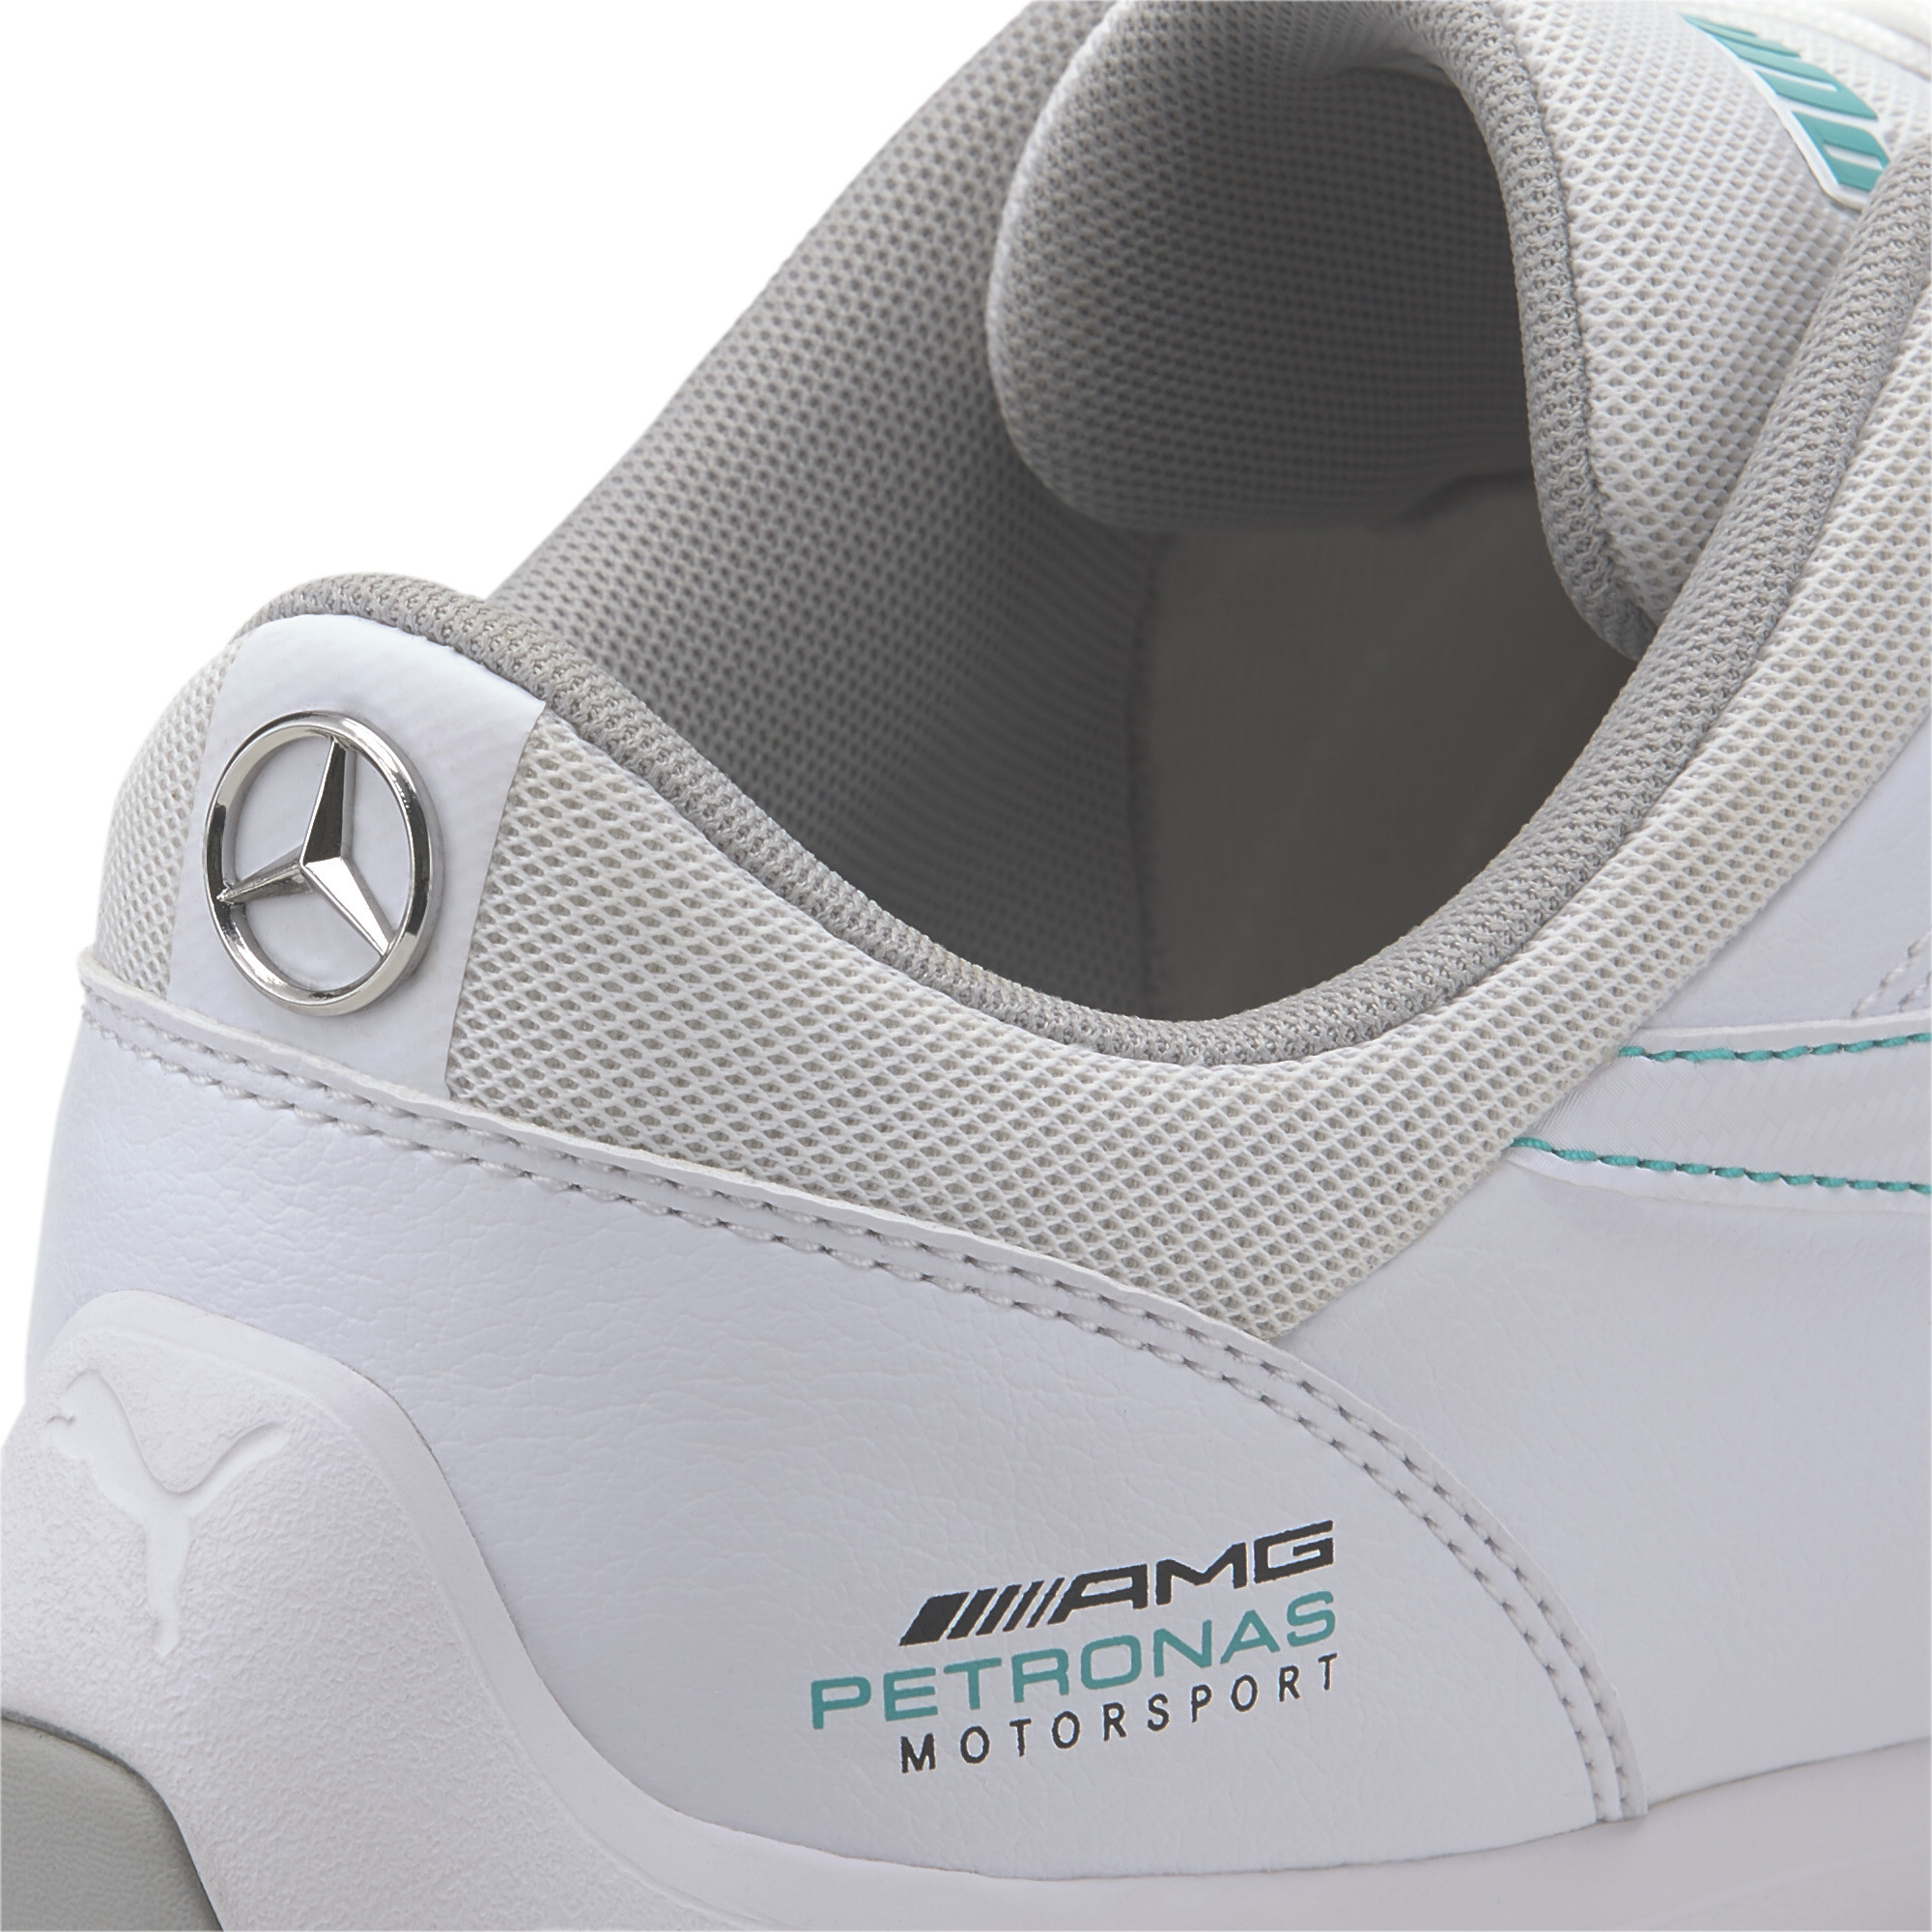 Custodio roto asentamiento  PUMA Men's Mercedes-AMG Petronas Kart Cat III Motorsport Shoes   eBay